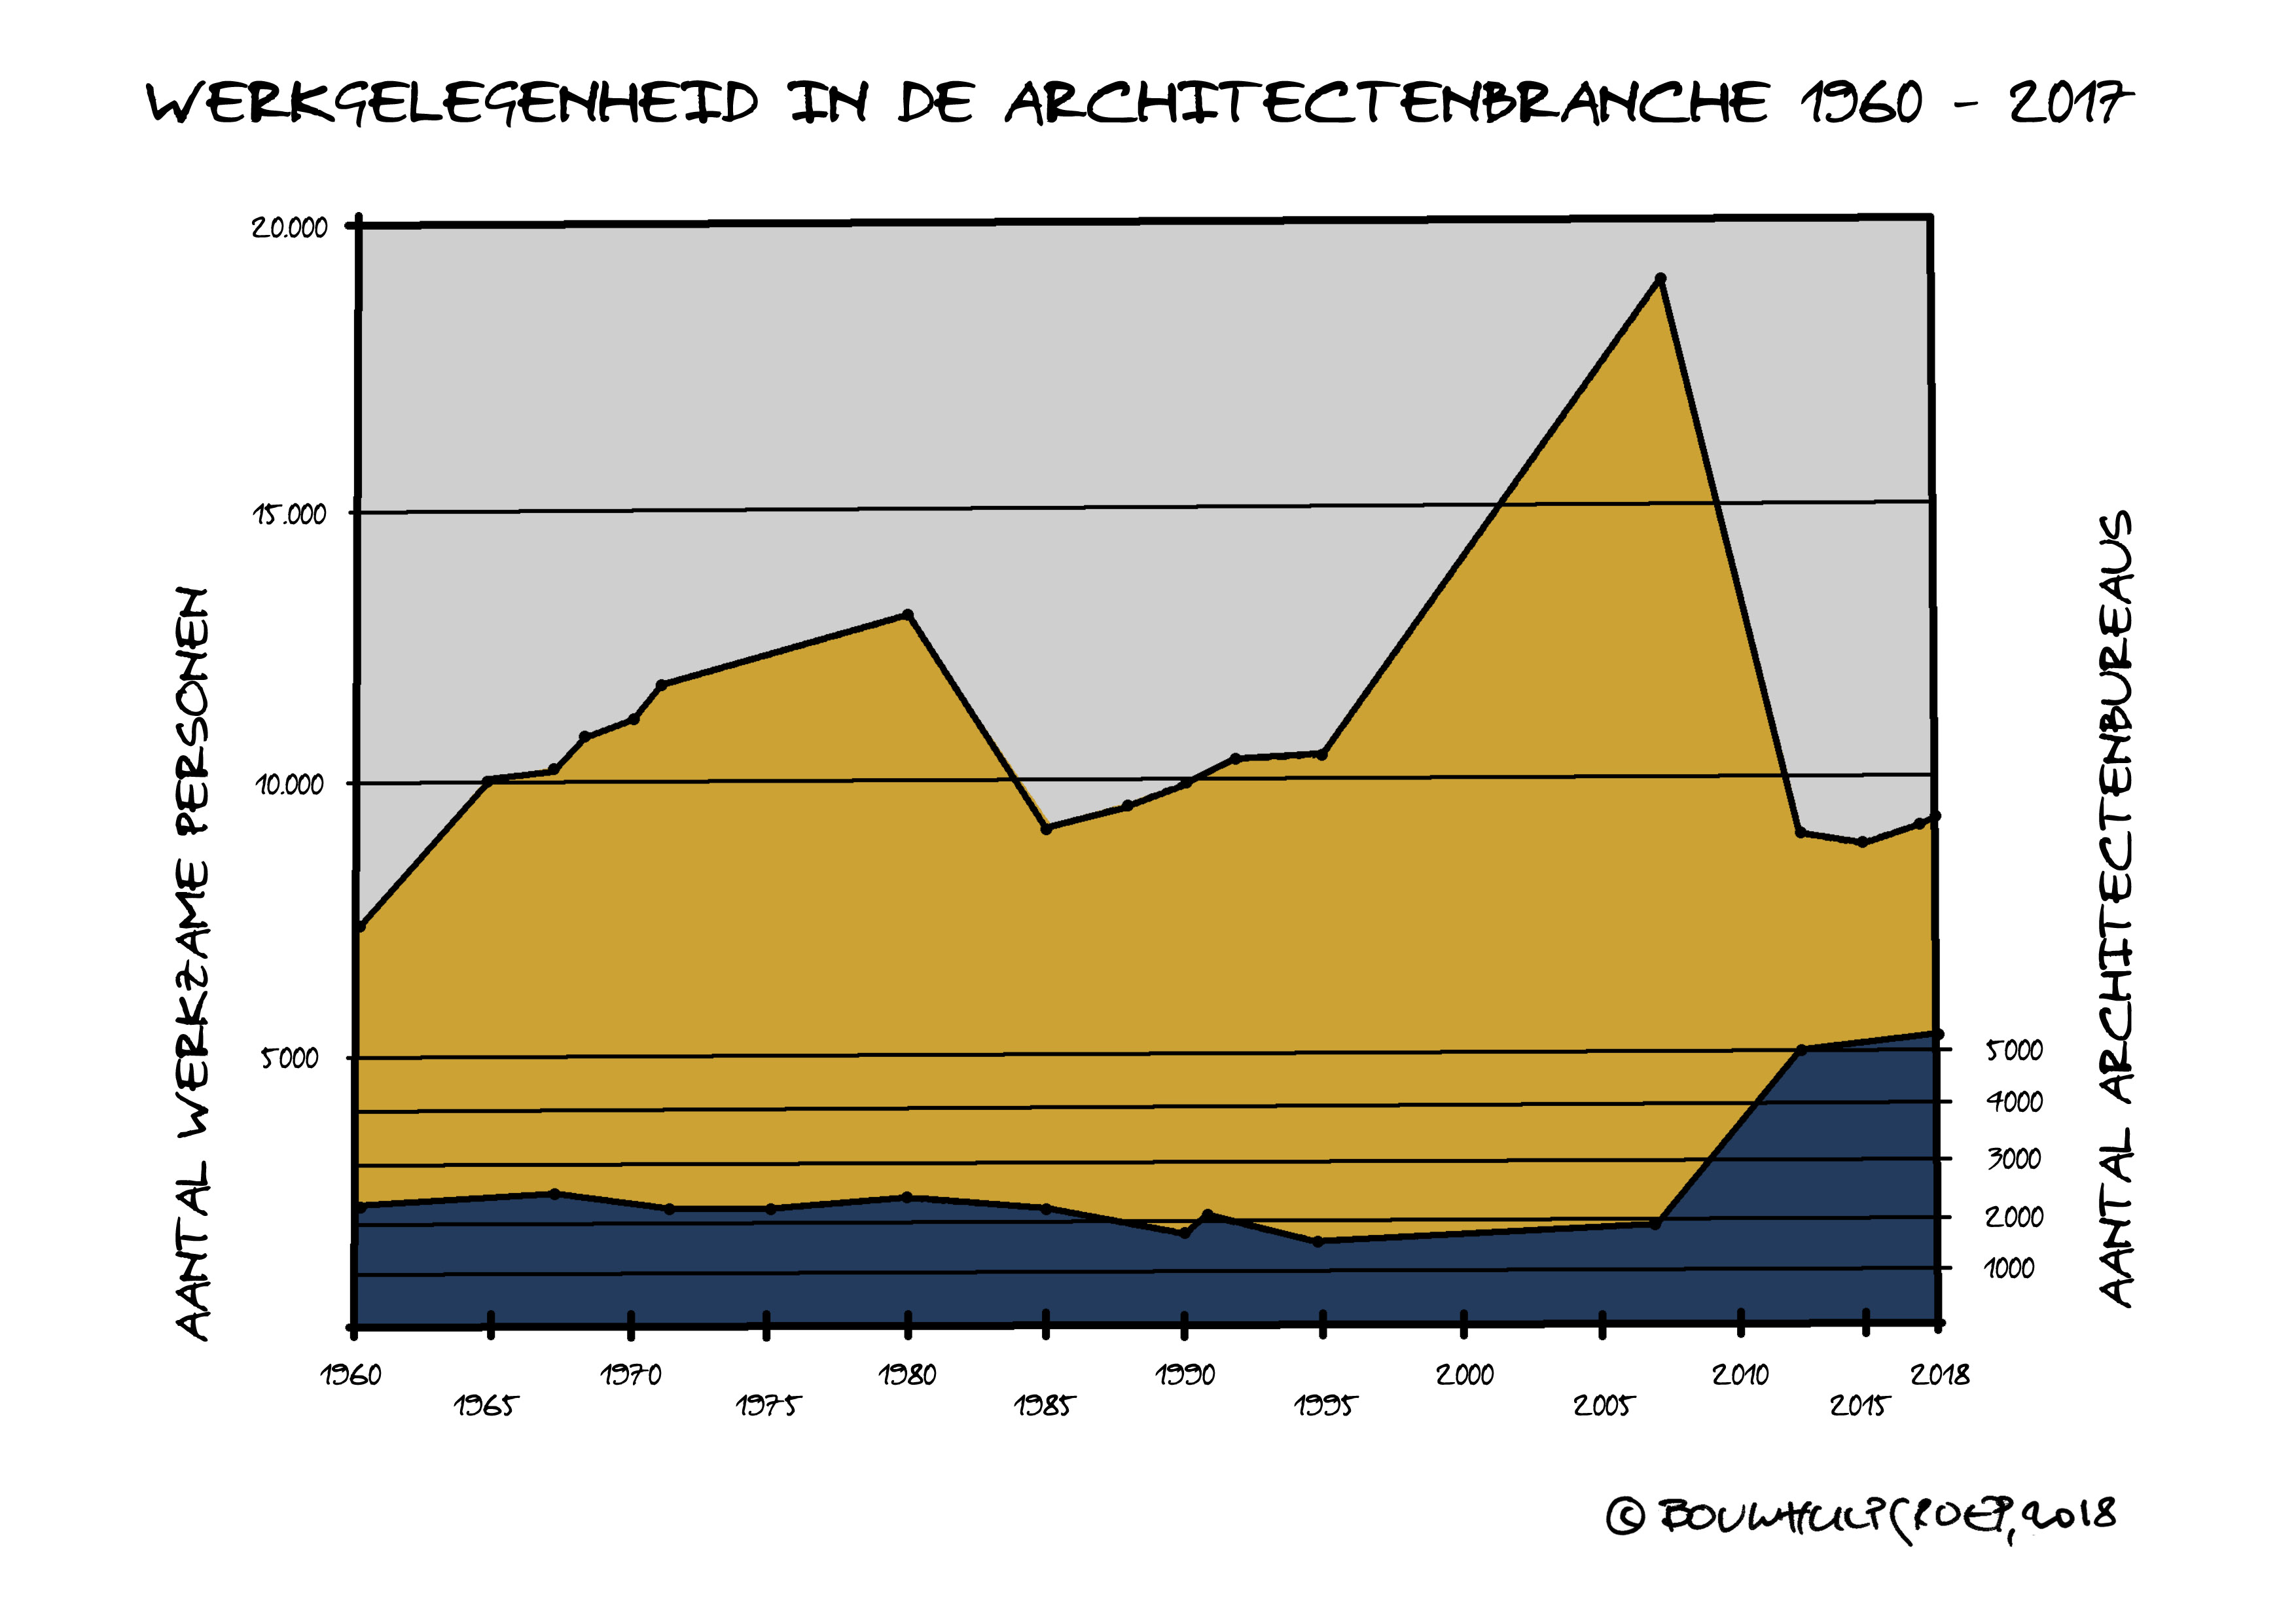 De nieuwe architect